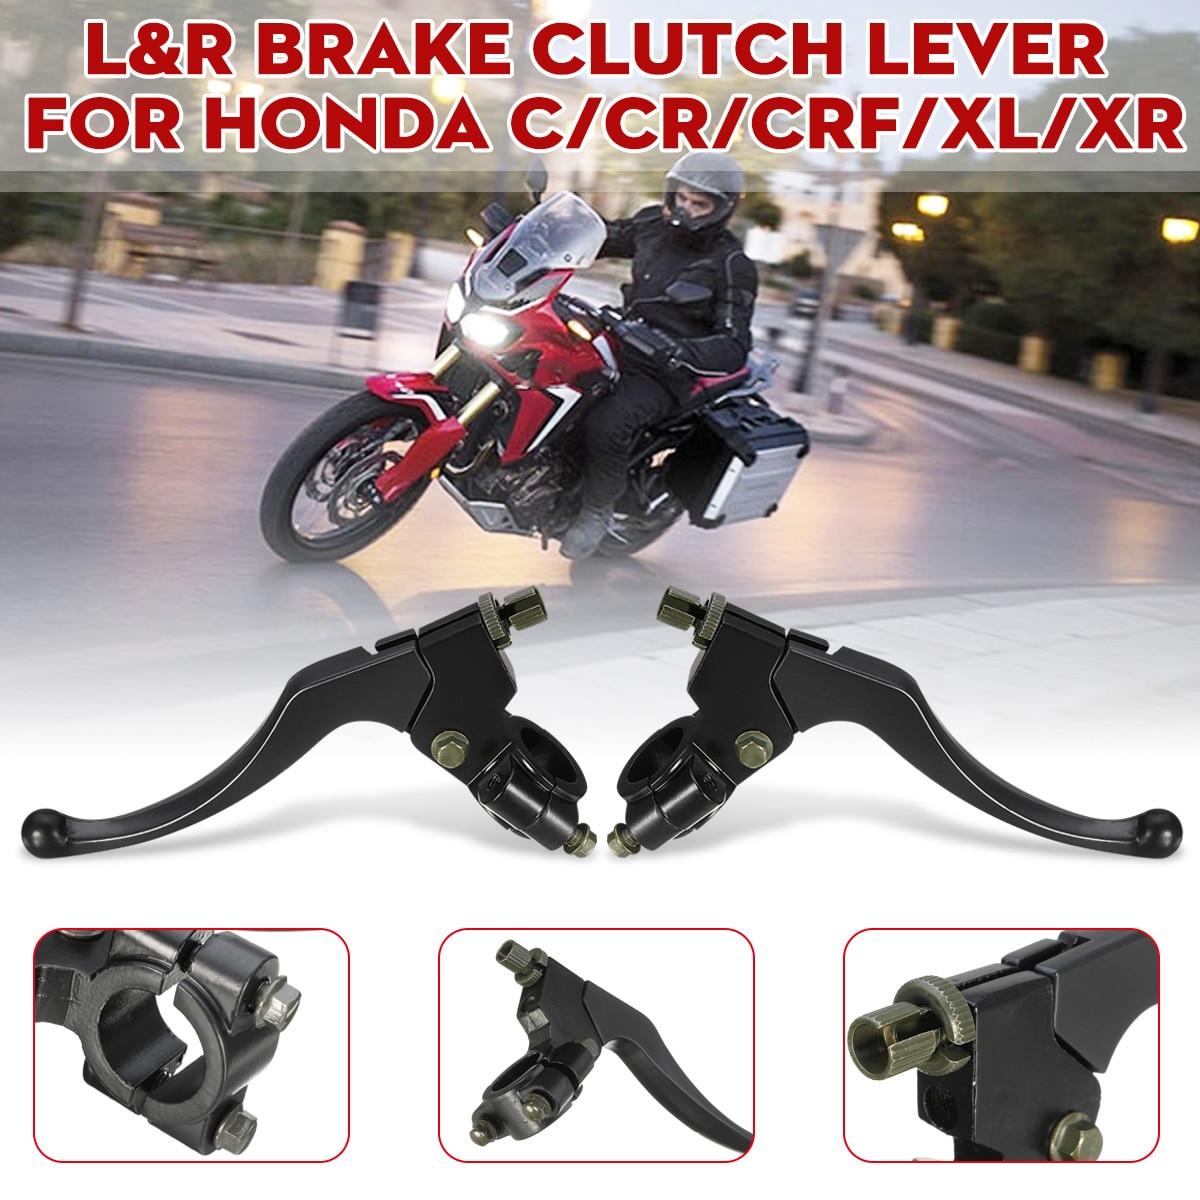 Embrague de palanca de freno de motocicleta negra izquierda/frontal derecho para HONDA C/CR/CRF/XL 1977-2011 2012 2013 2014 2015 2016